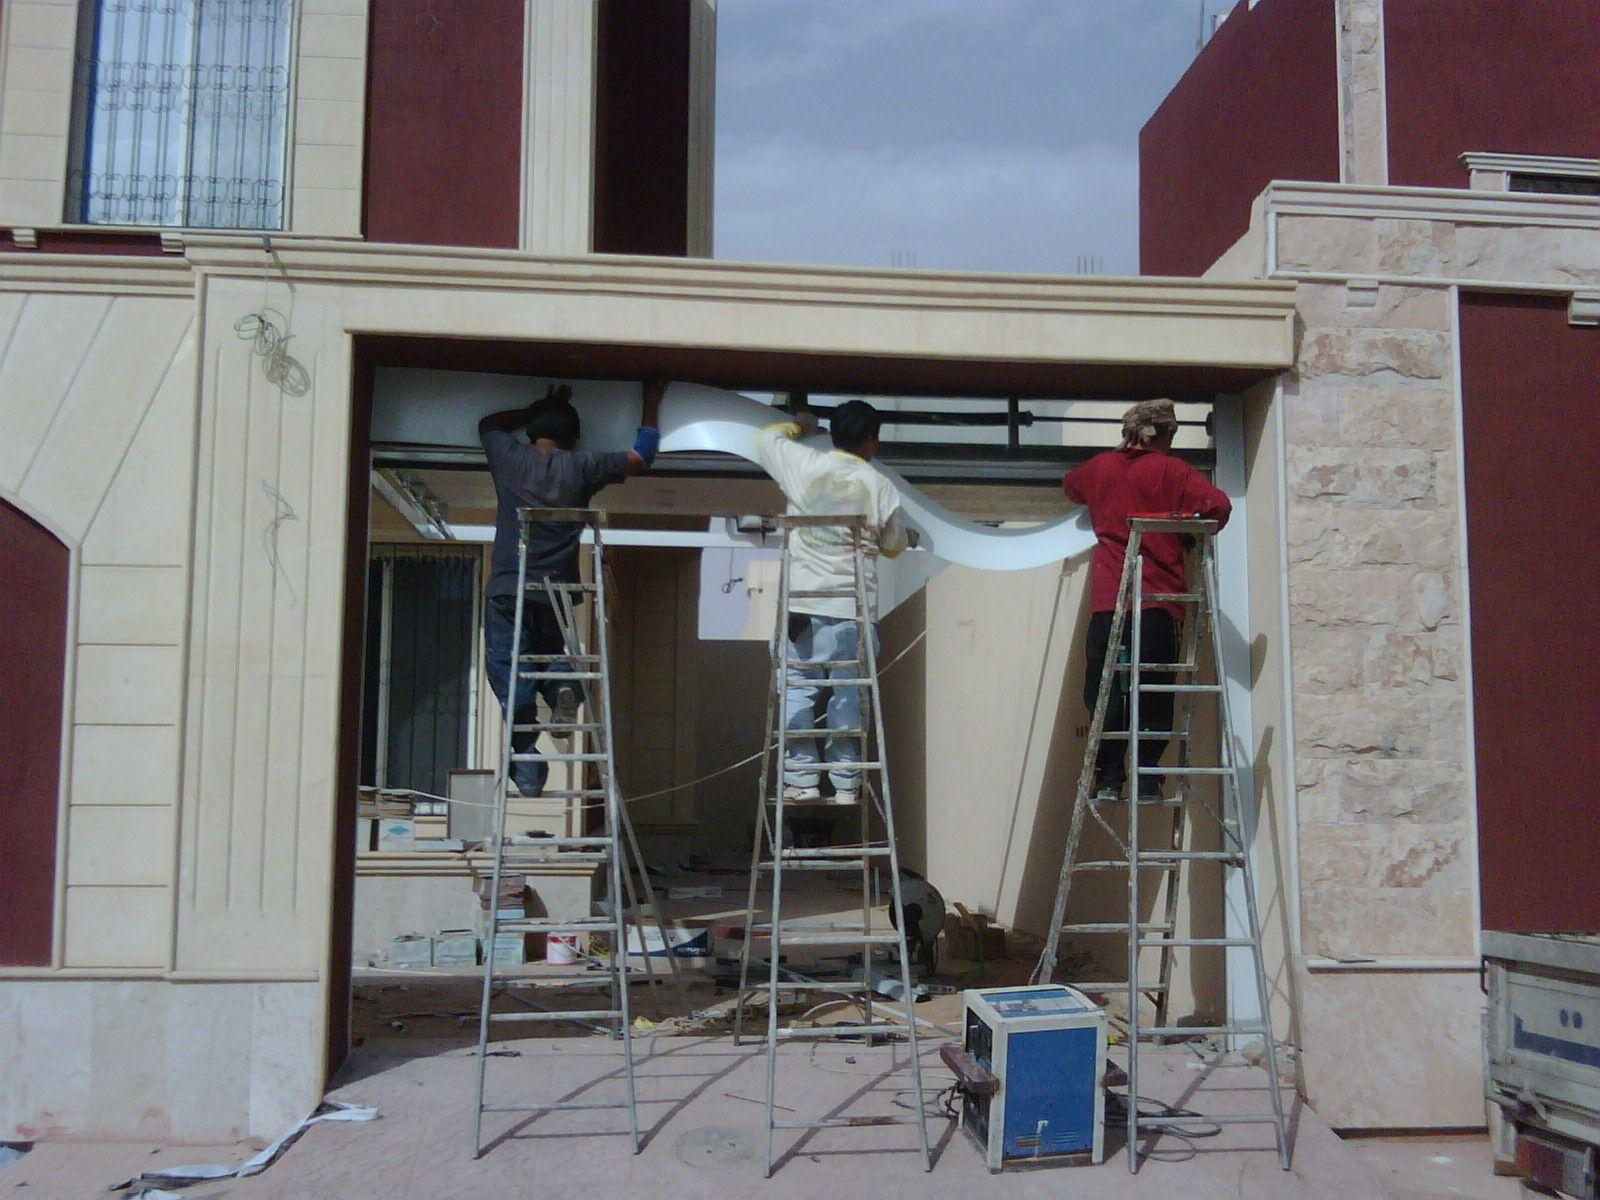 l services dallas doors org cincinnati repair door service uncommon company garage tx handballtunisie